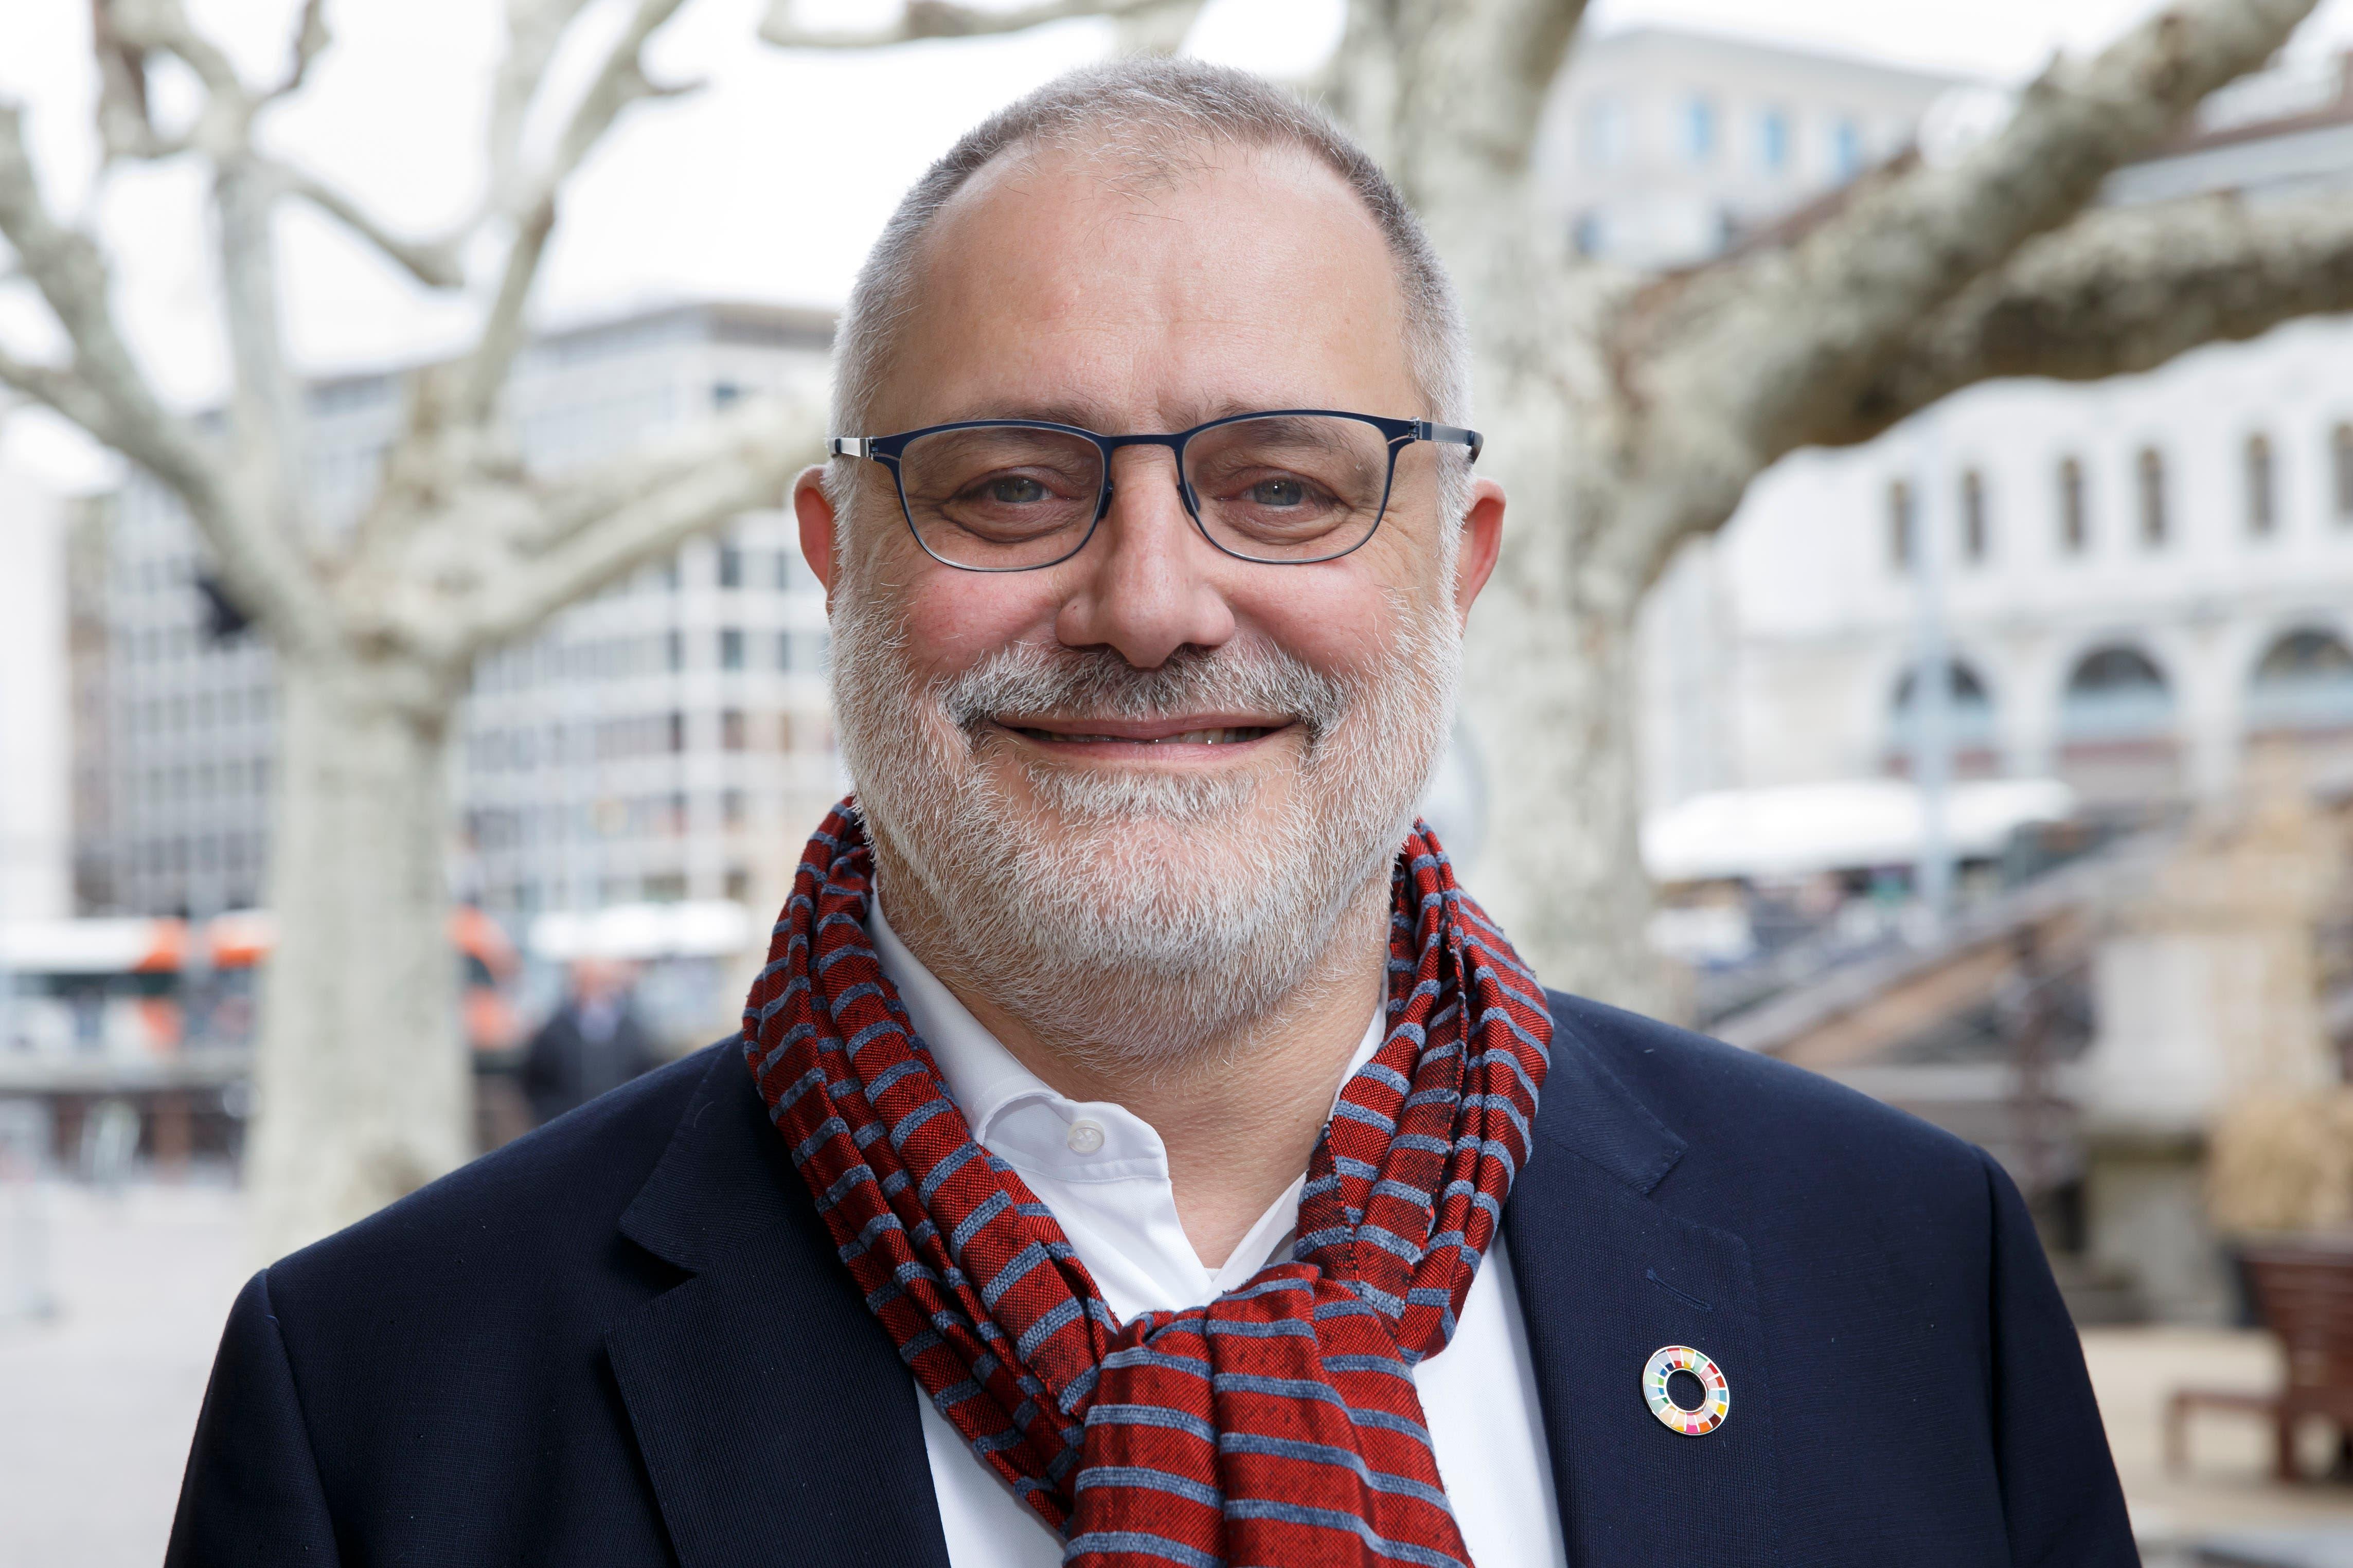 Carlo Sommaruga, SP. (Bild: KEYSTONE/SALVATORE DI NOLFI)